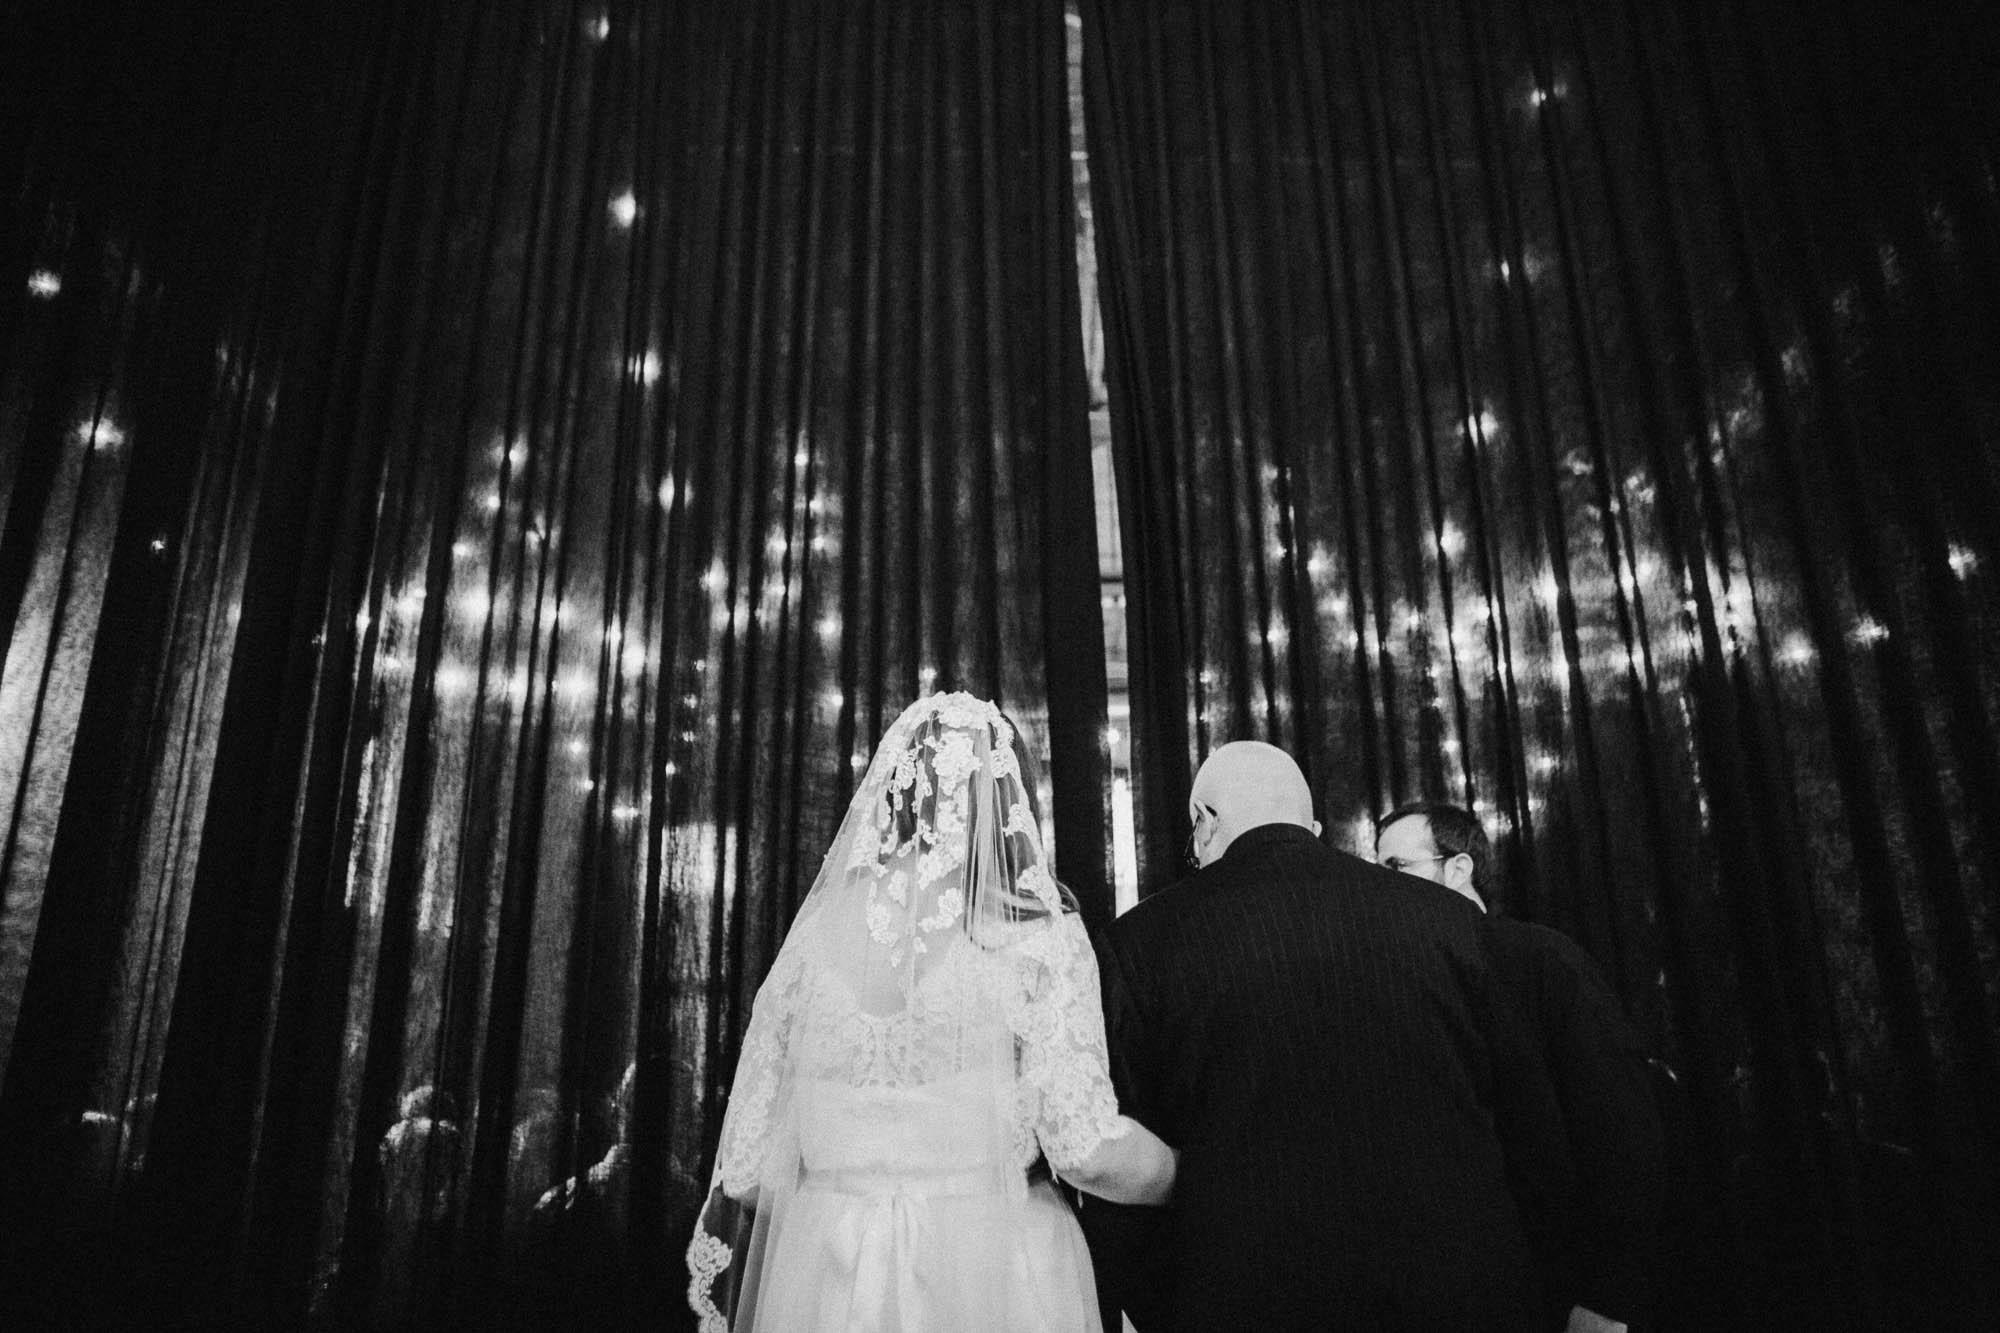 Highline-Car-House-Wedding-Columbus-Kristin-Aaron-067.jpg